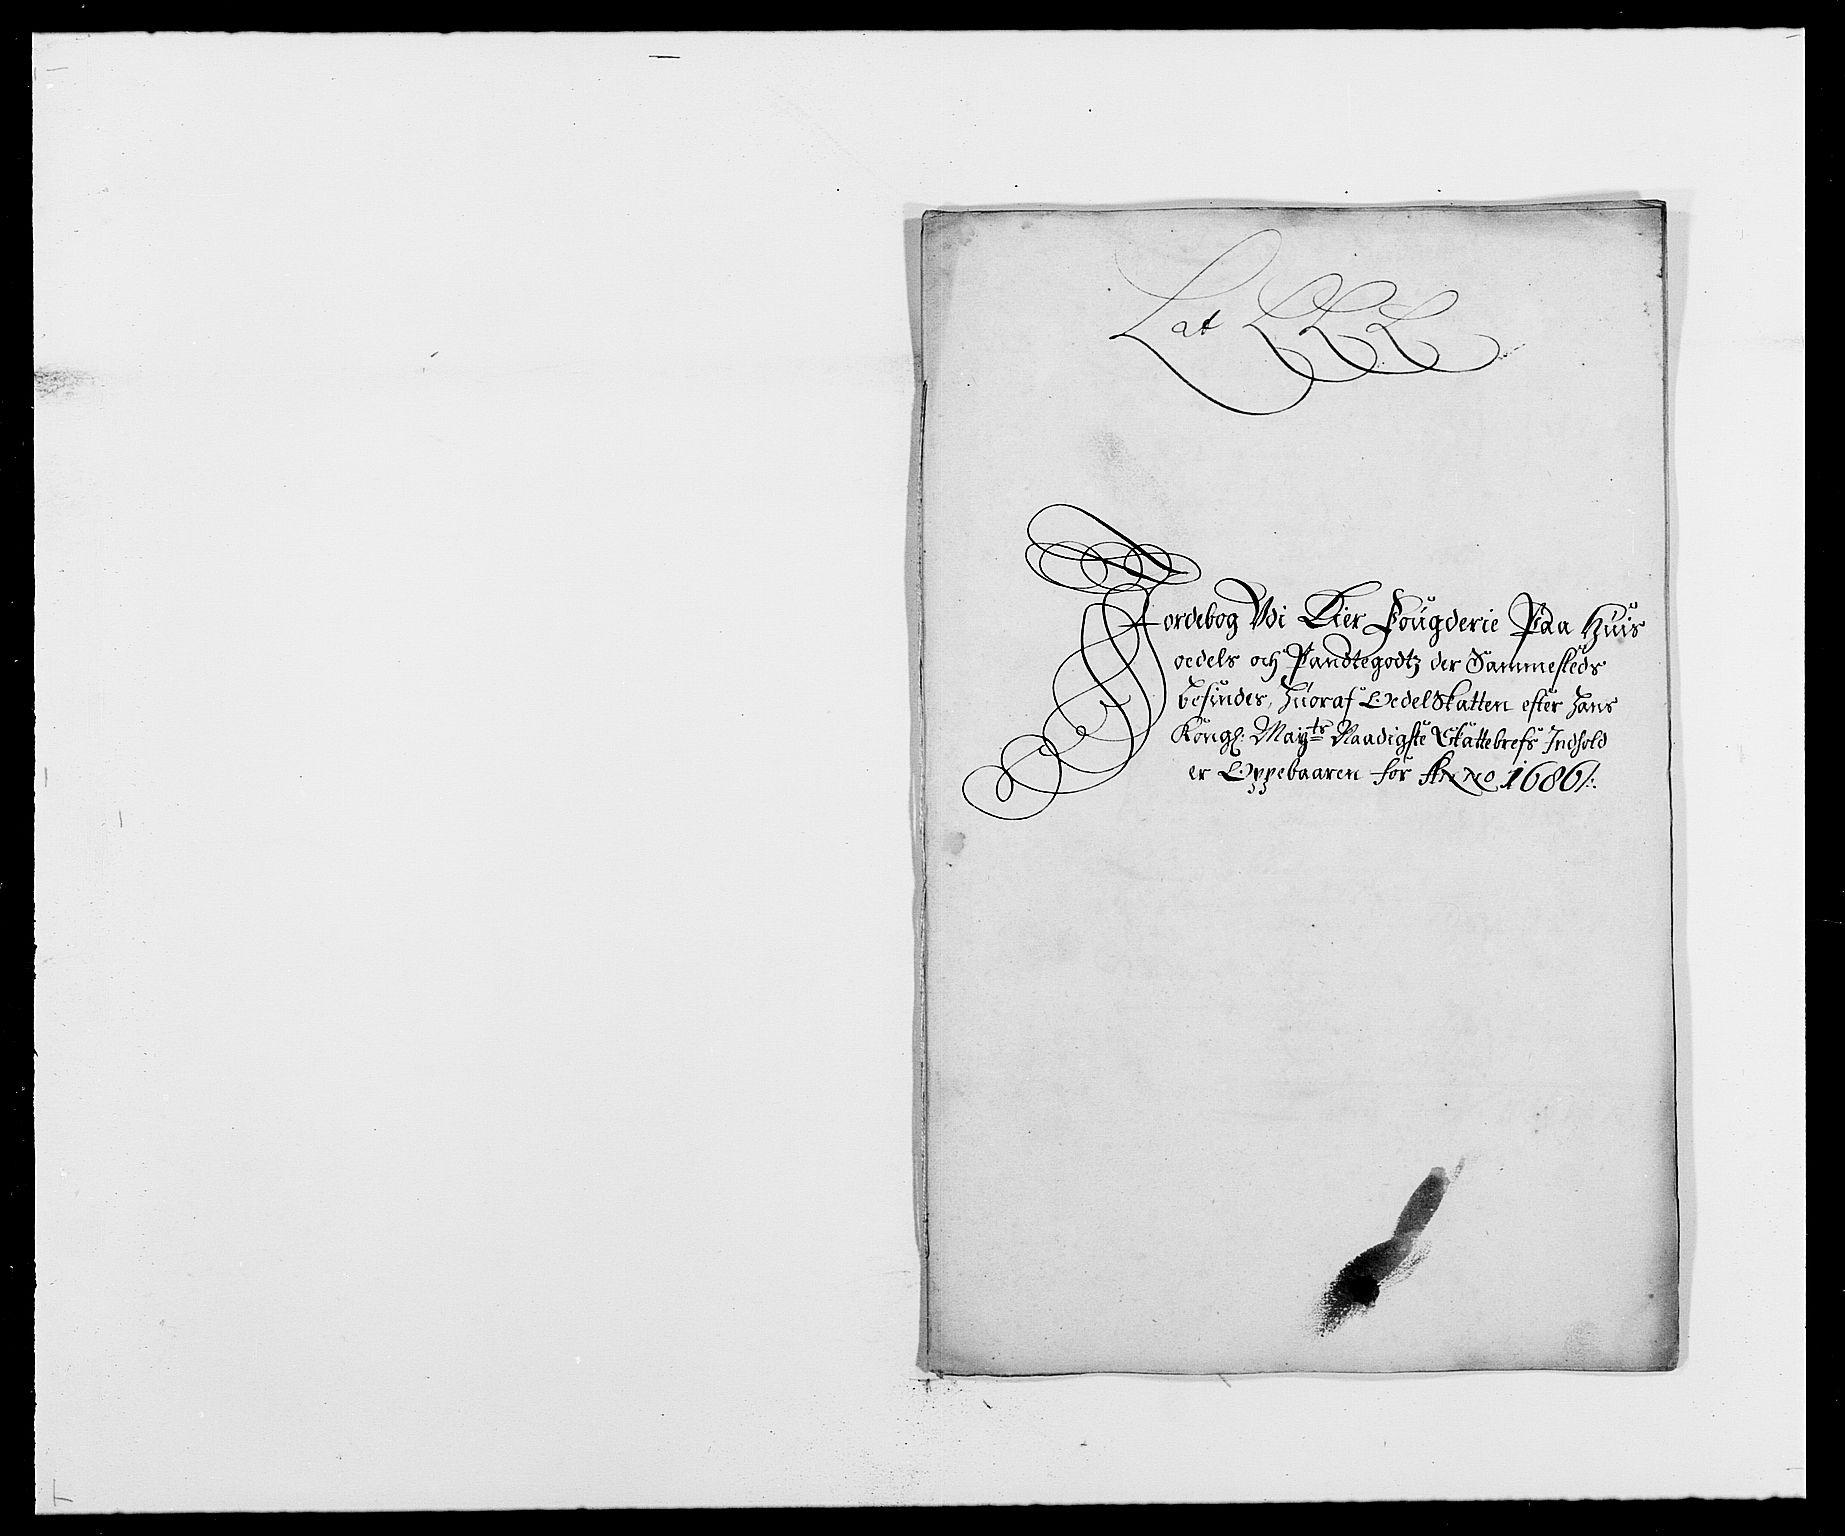 RA, Rentekammeret inntil 1814, Reviderte regnskaper, Fogderegnskap, R27/L1687: Fogderegnskap Lier, 1678-1686, s. 260